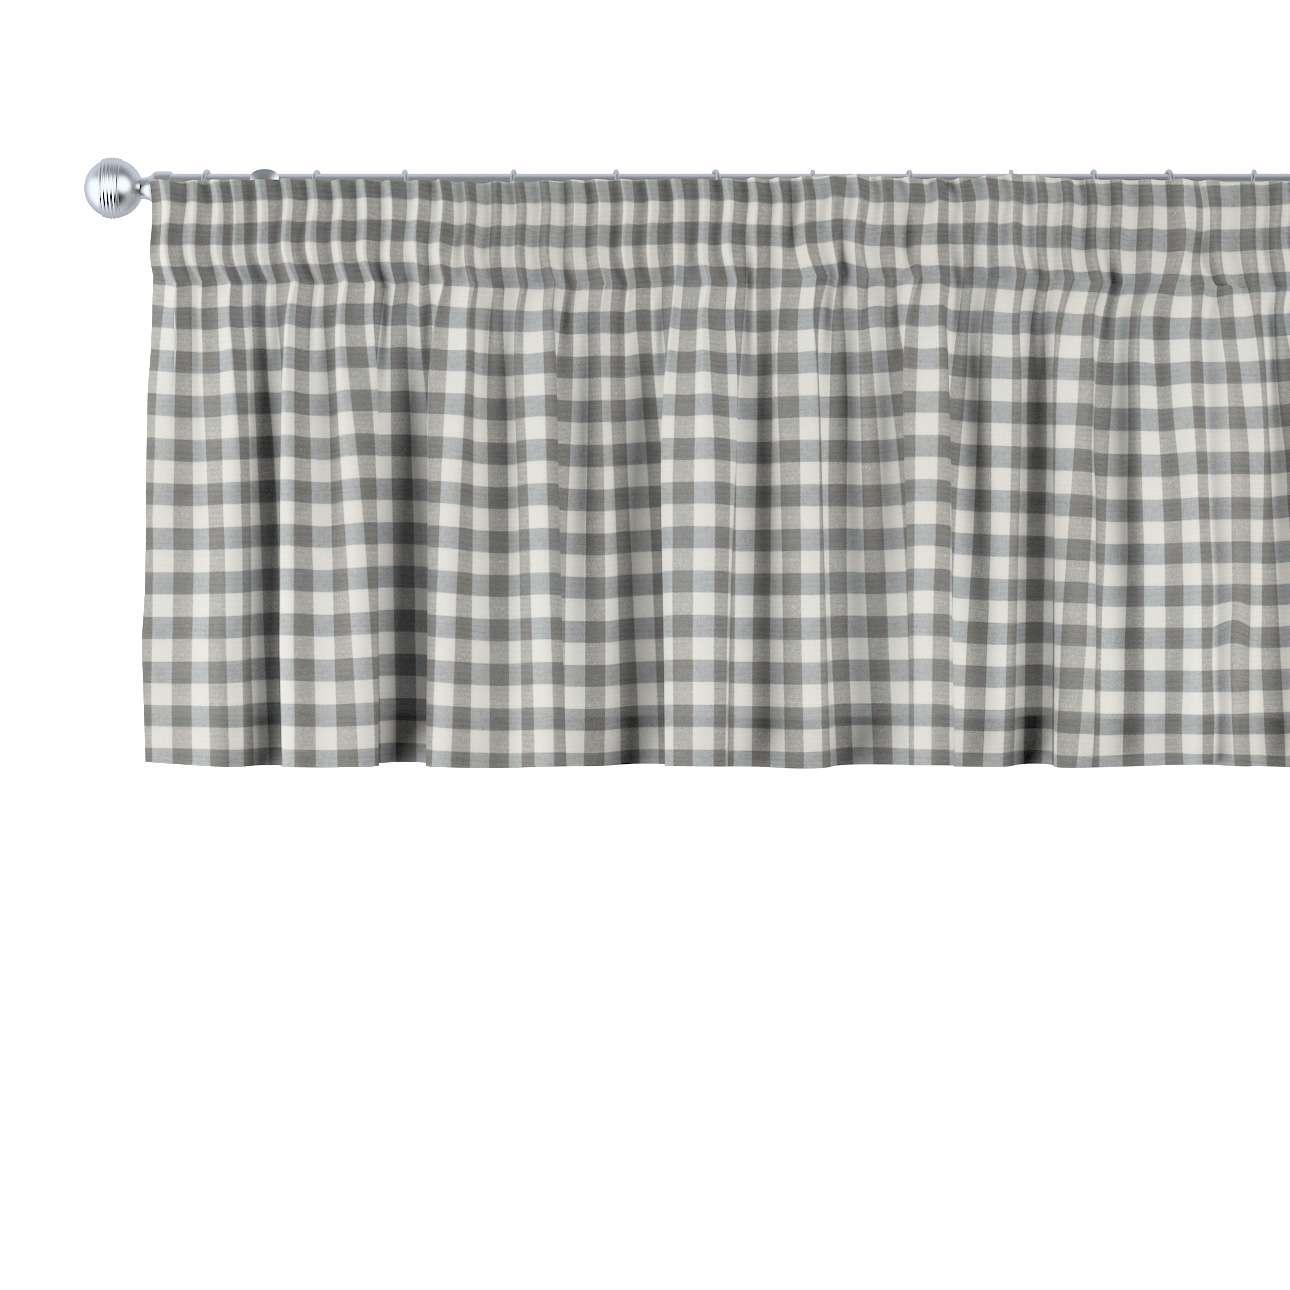 Lambrekin na řasící pásce 130 × 40 cm v kolekci Quadro, látka: 136-11